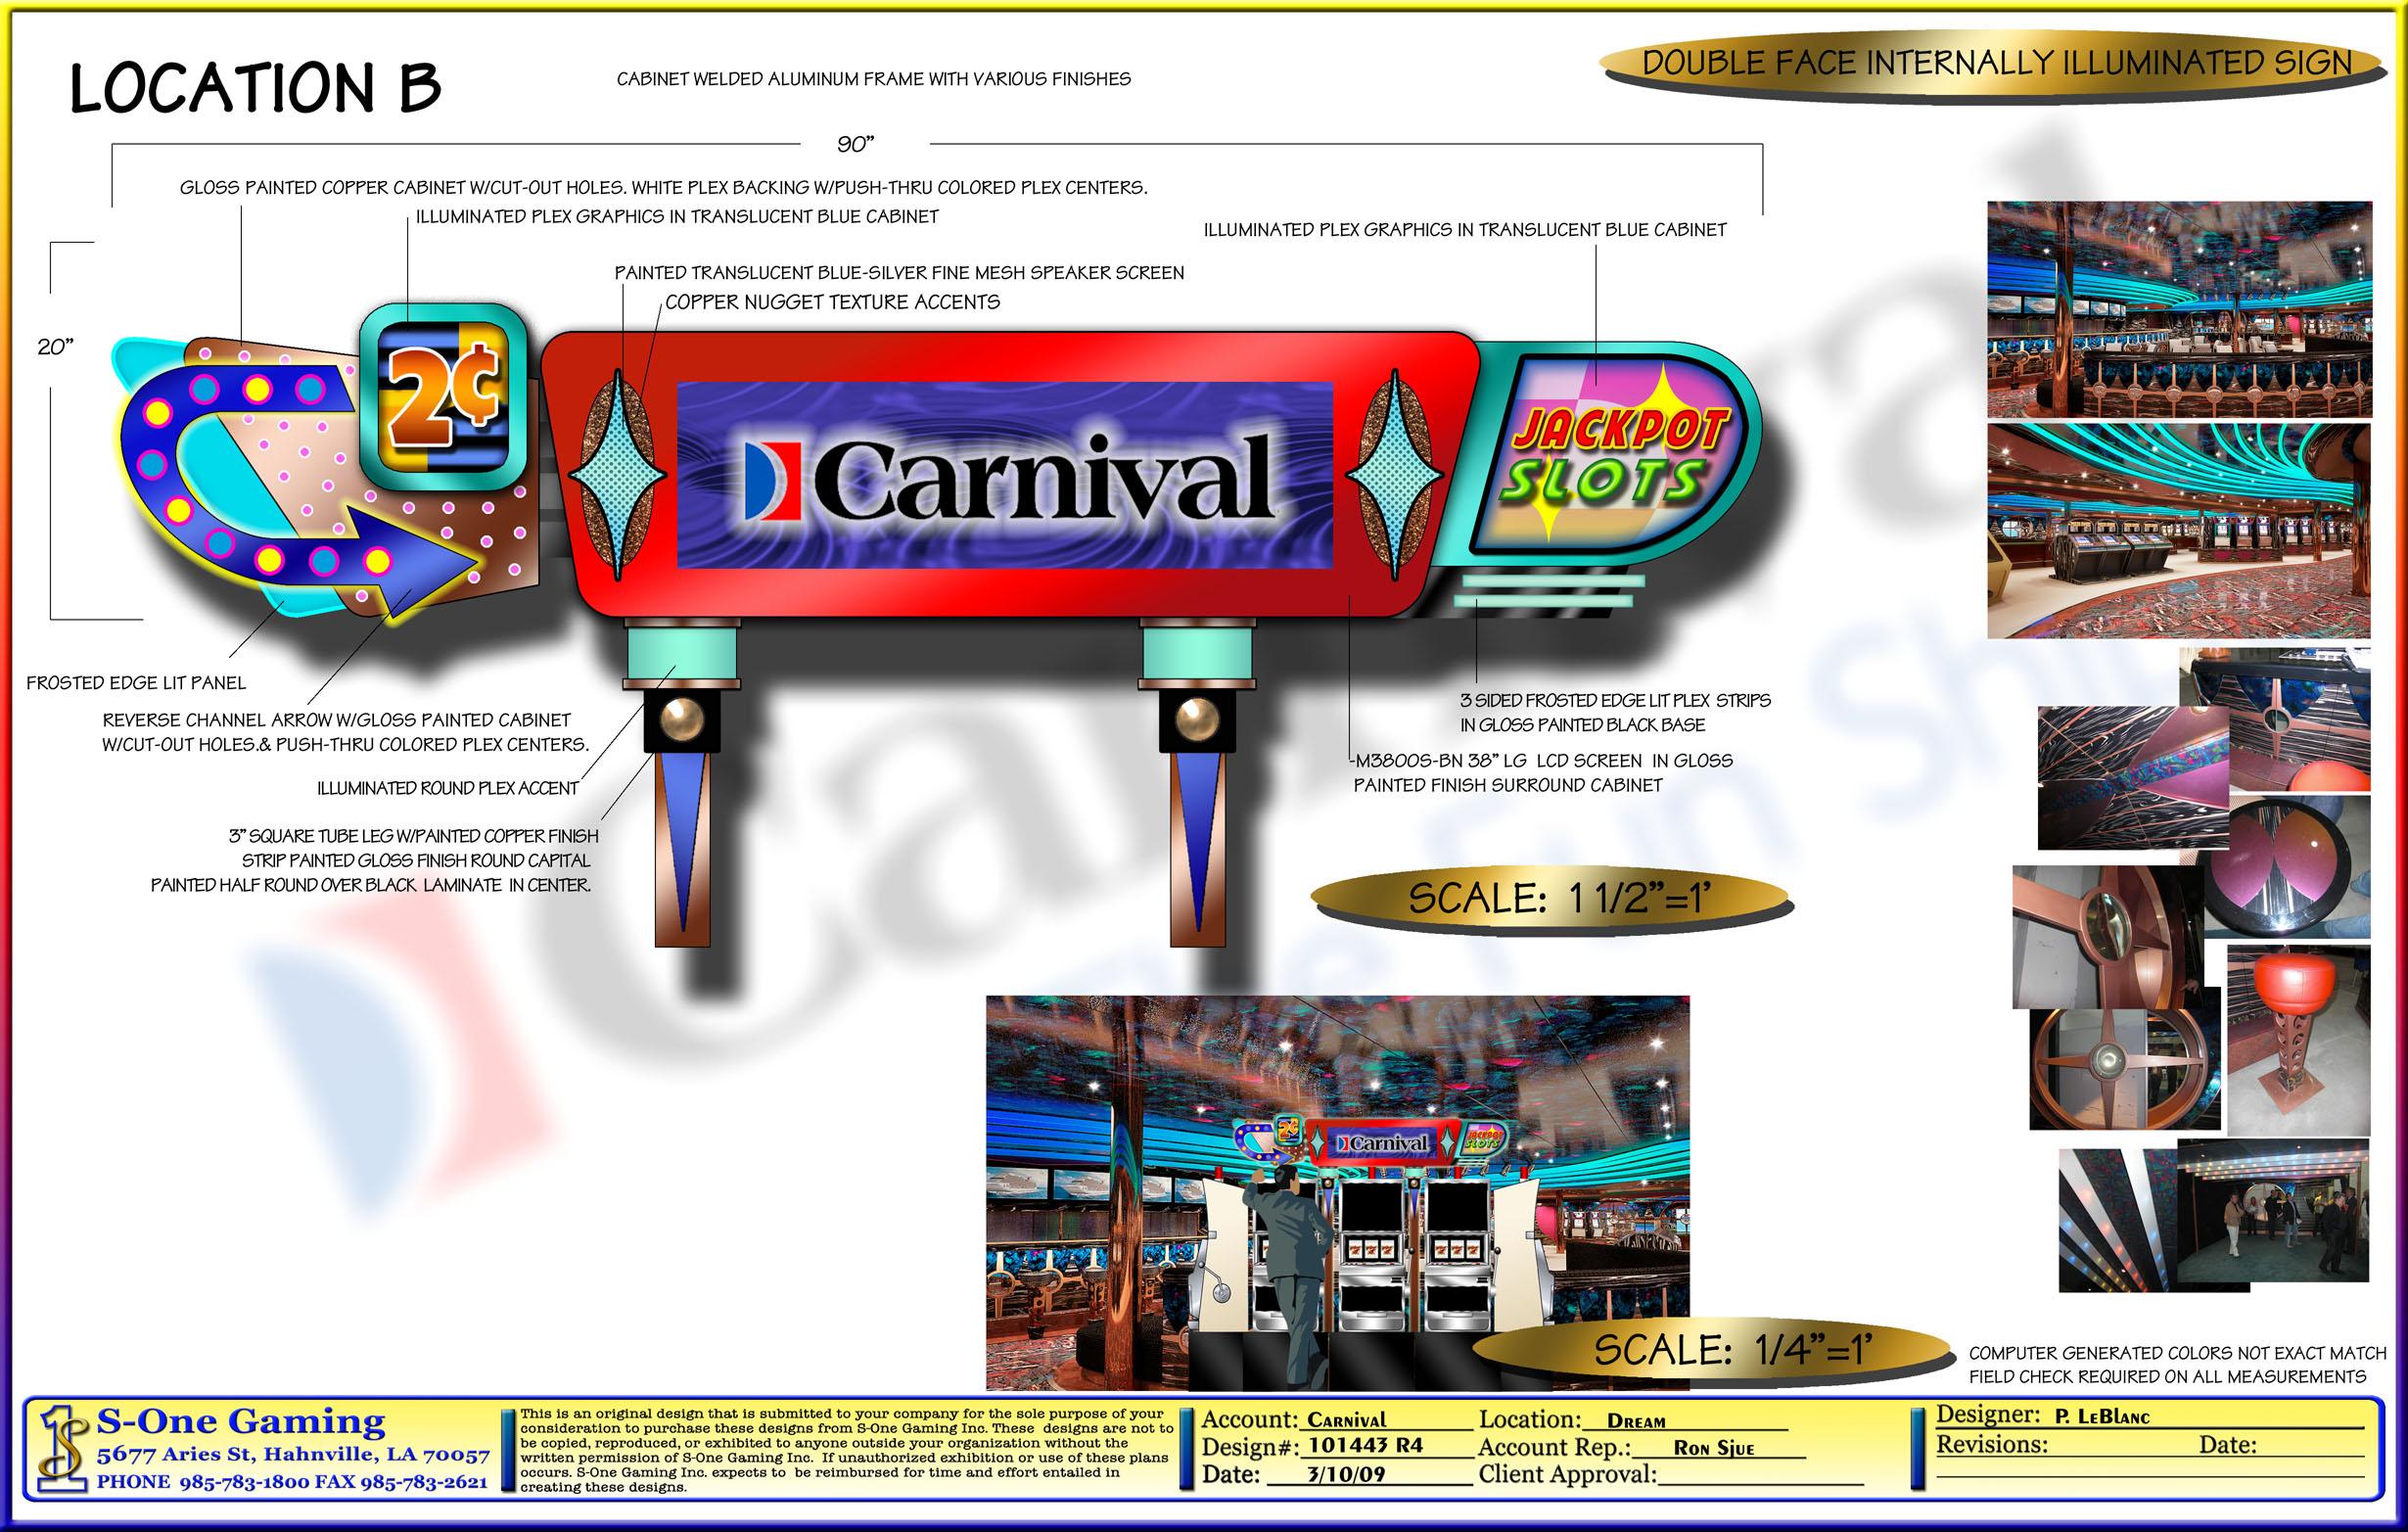 101443 R4 Carn DREAM Loc B 38in strech LCD.jpg